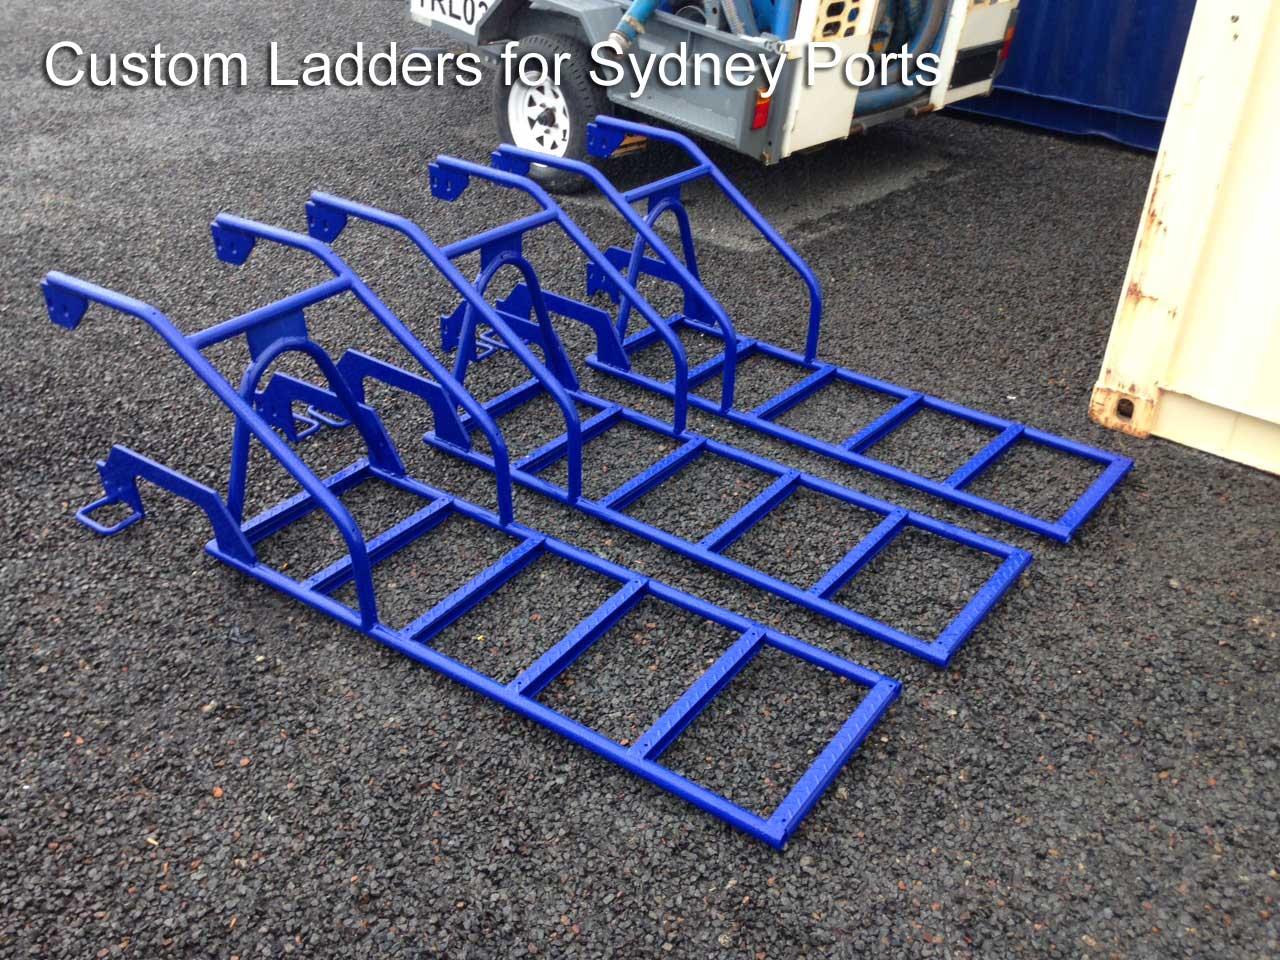 Custom-Ladders-for-Sydney-Ports